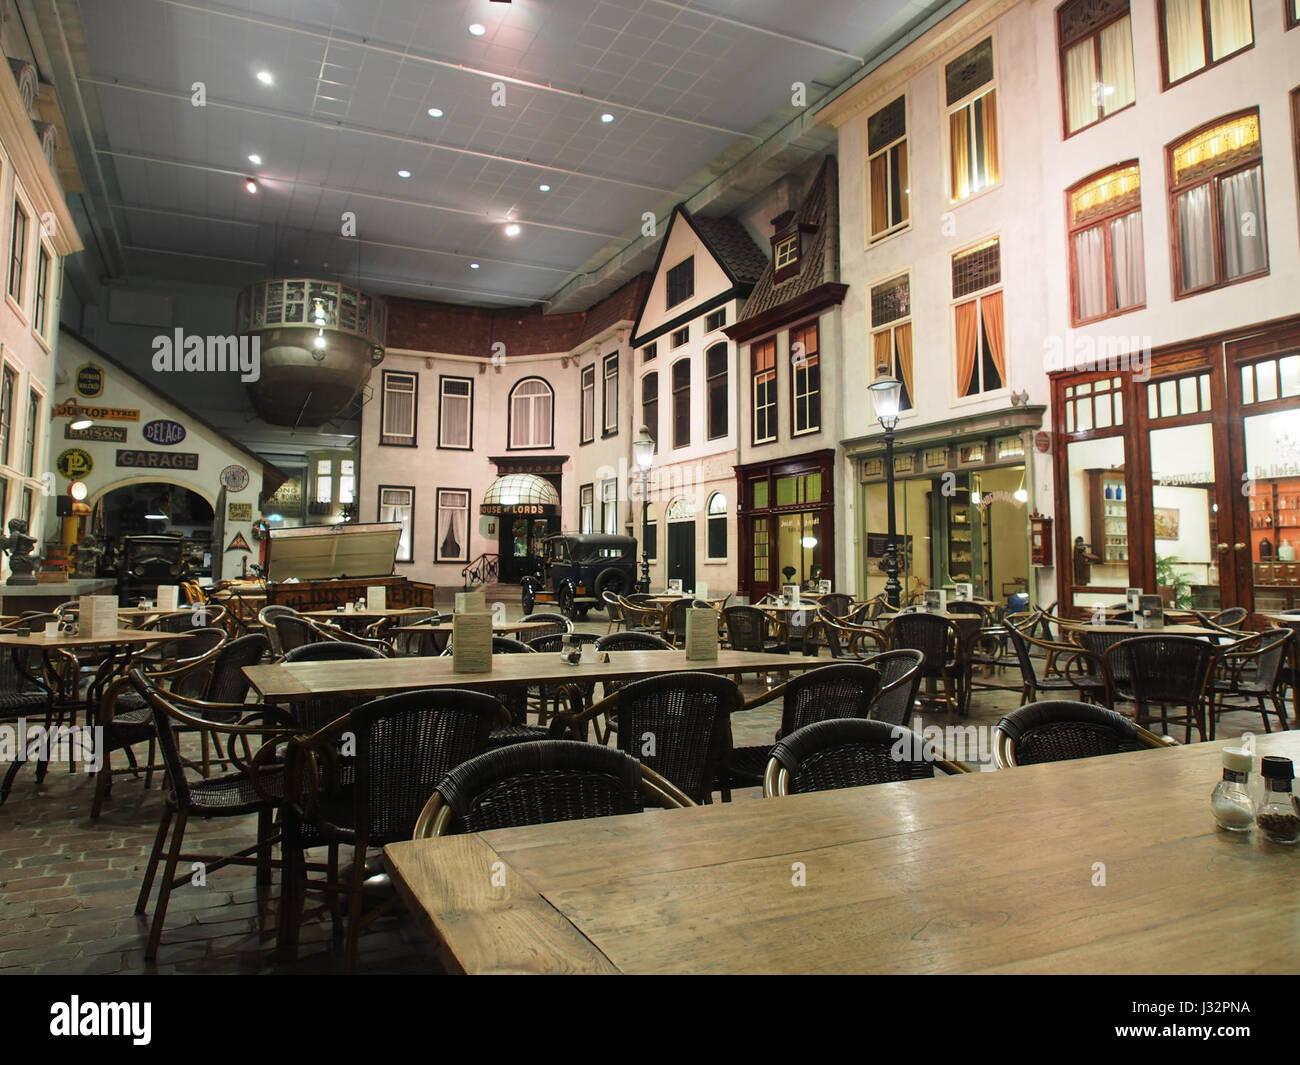 Restaurant of the Louwman museum Stock Photo